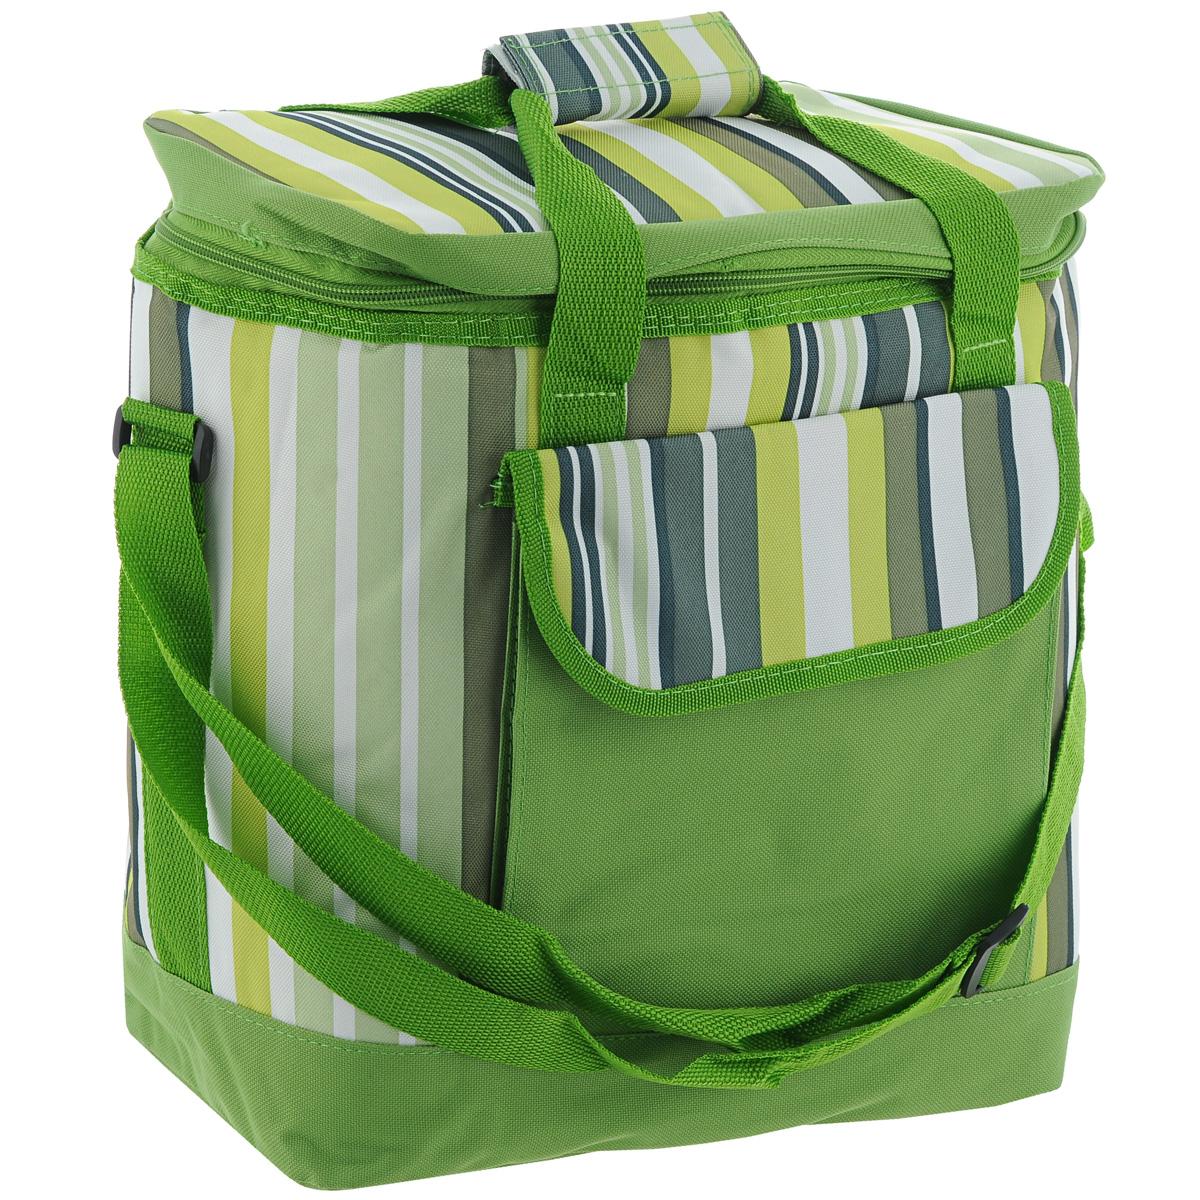 "Термосумка ""Green Glade"", цвет: зеленый, 20 л. Р1620"